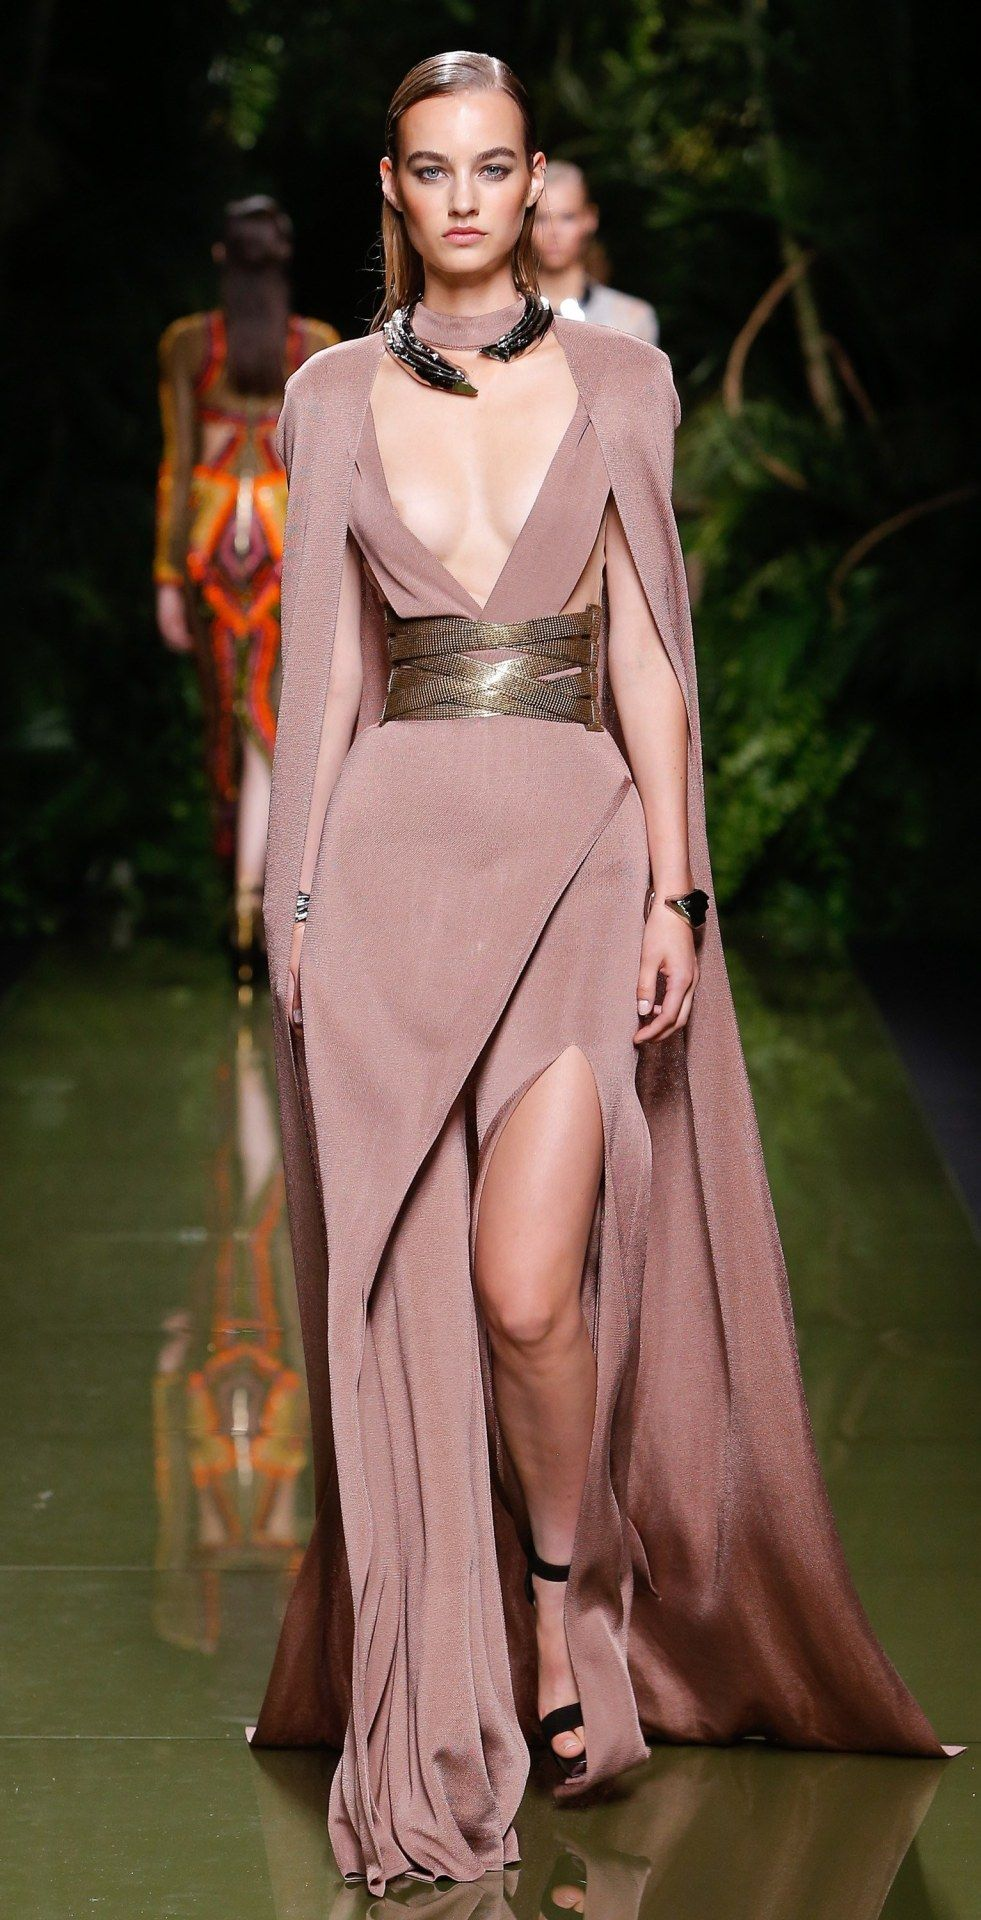 Moderno Perchas Vestido De Dama Ornamento - Colección de Vestidos de ...